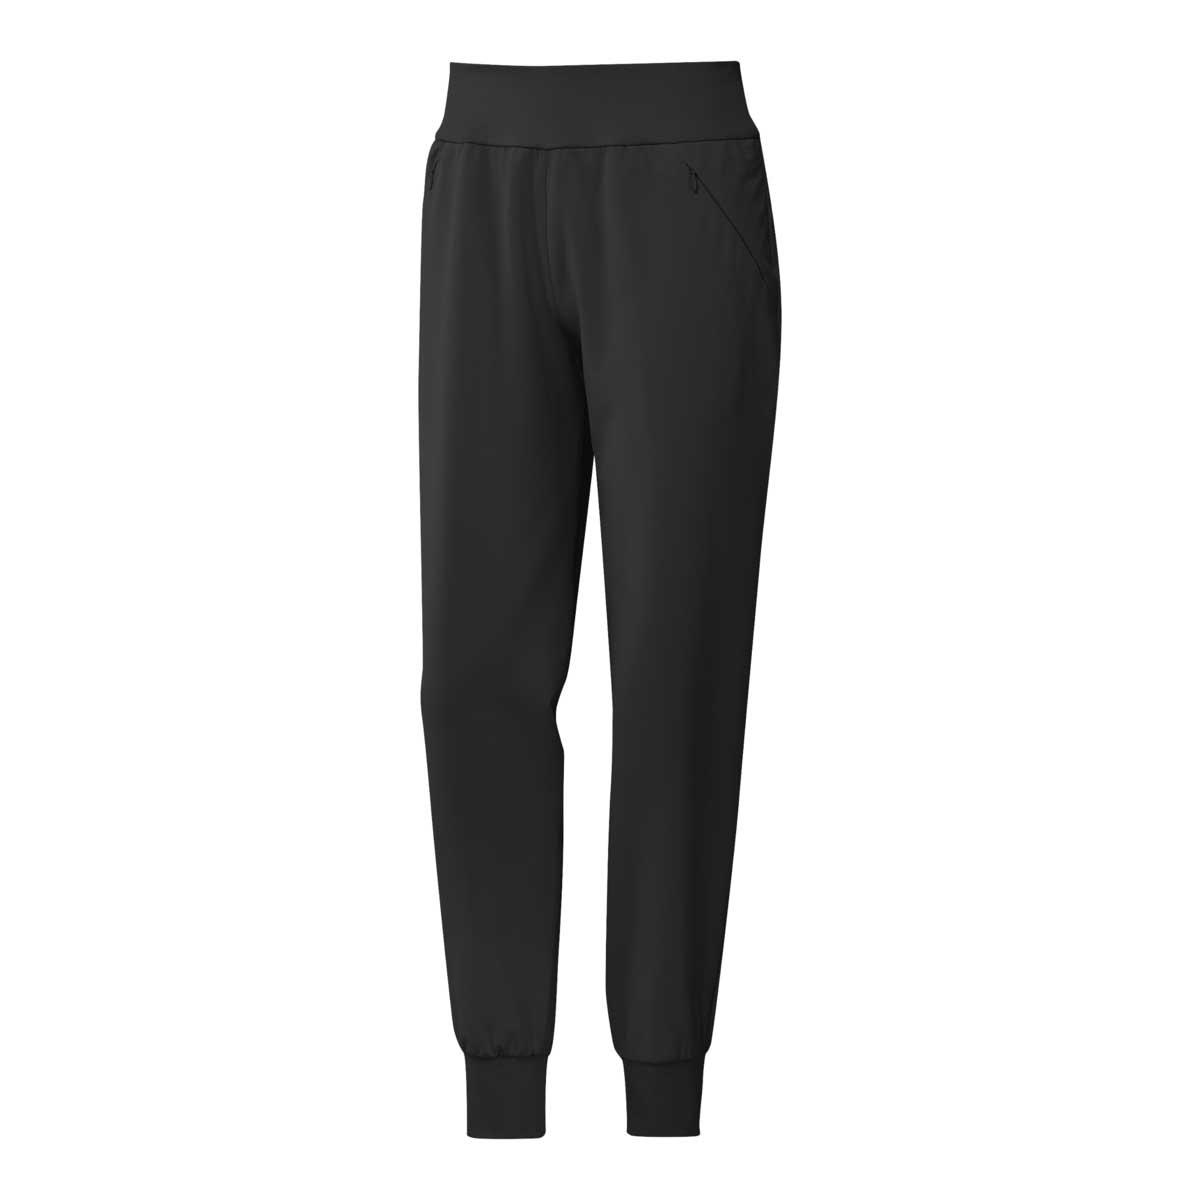 Adidas Women's Black Woven Jogger Pant